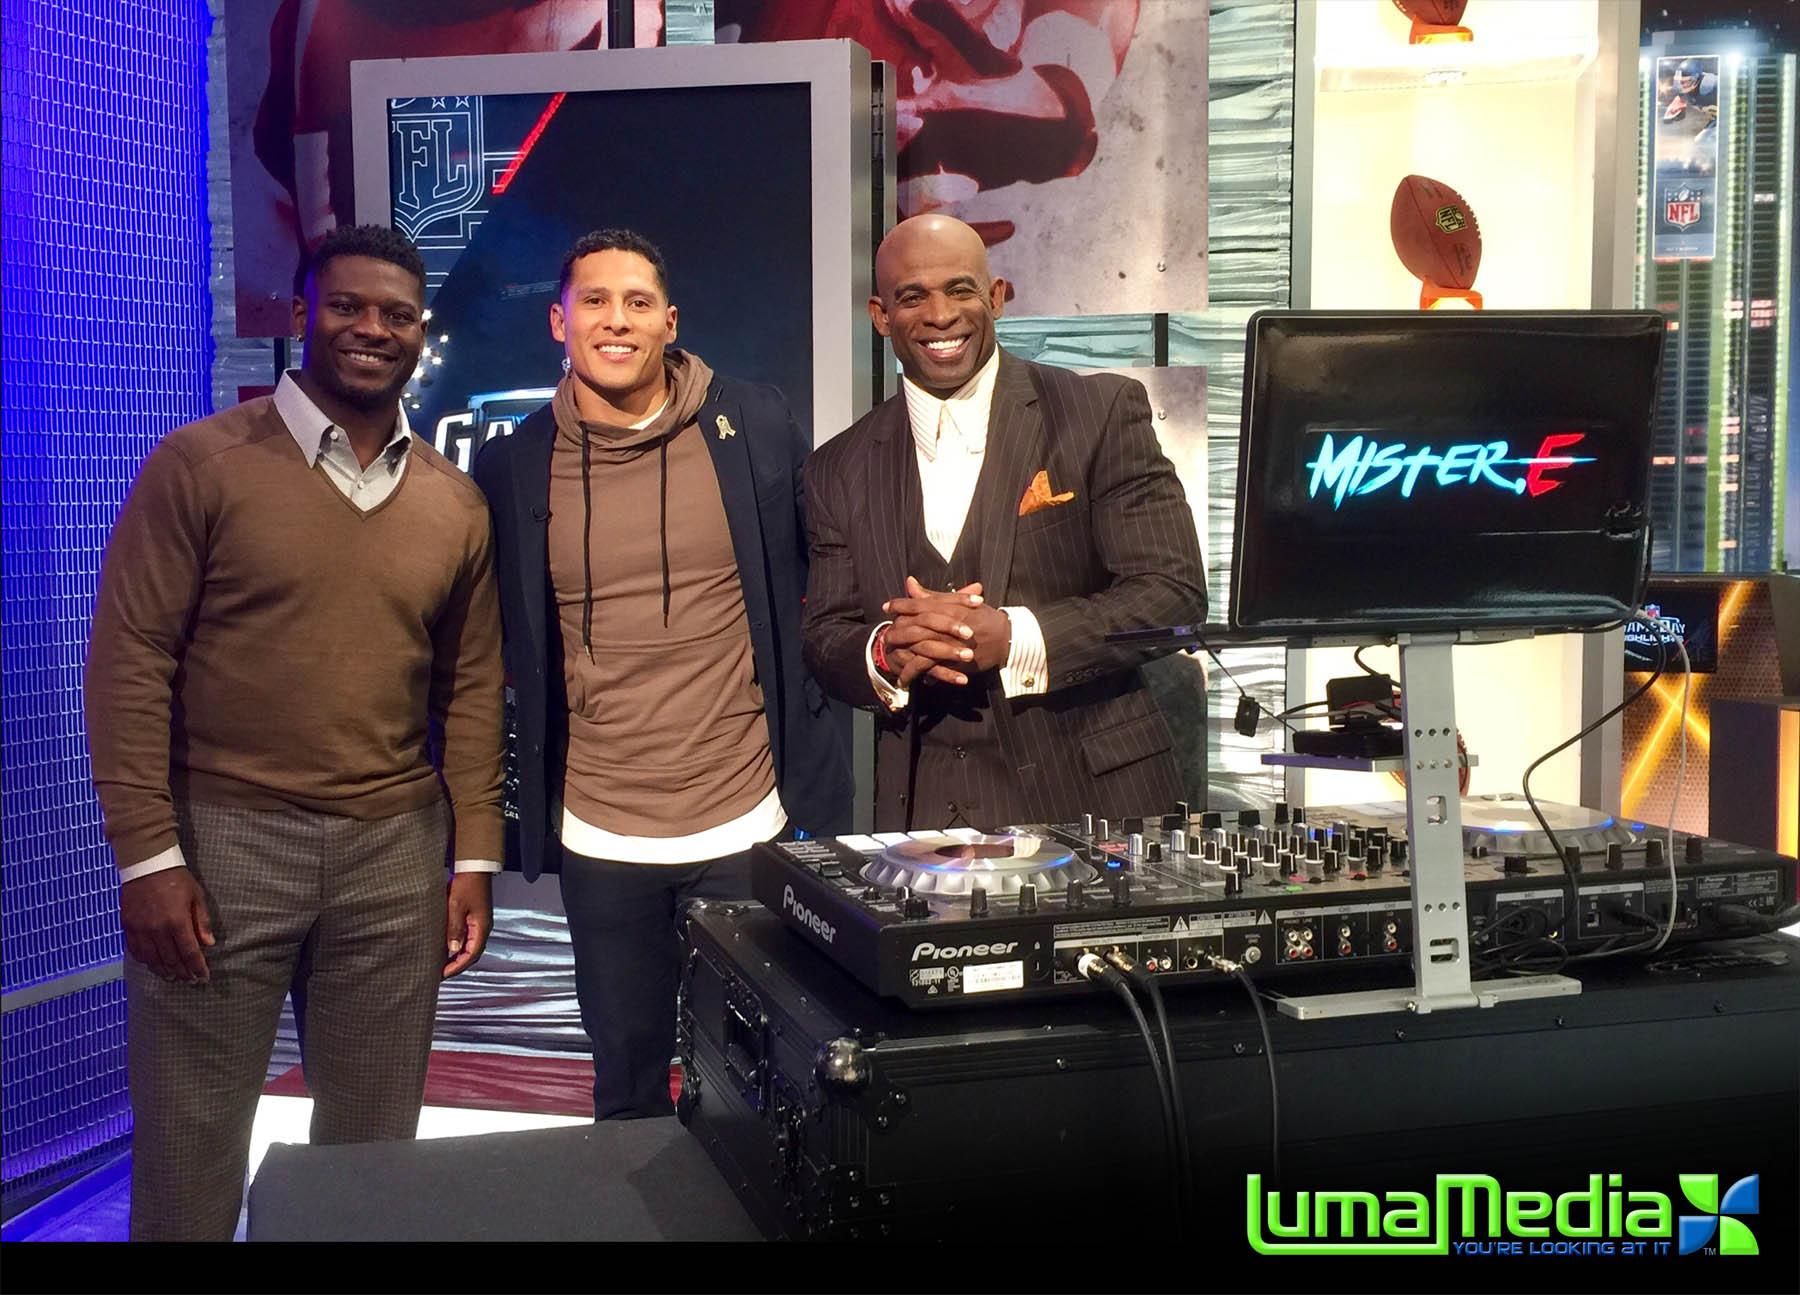 Ladainian Tomlinson, DJ MisterE & Deion Sanders